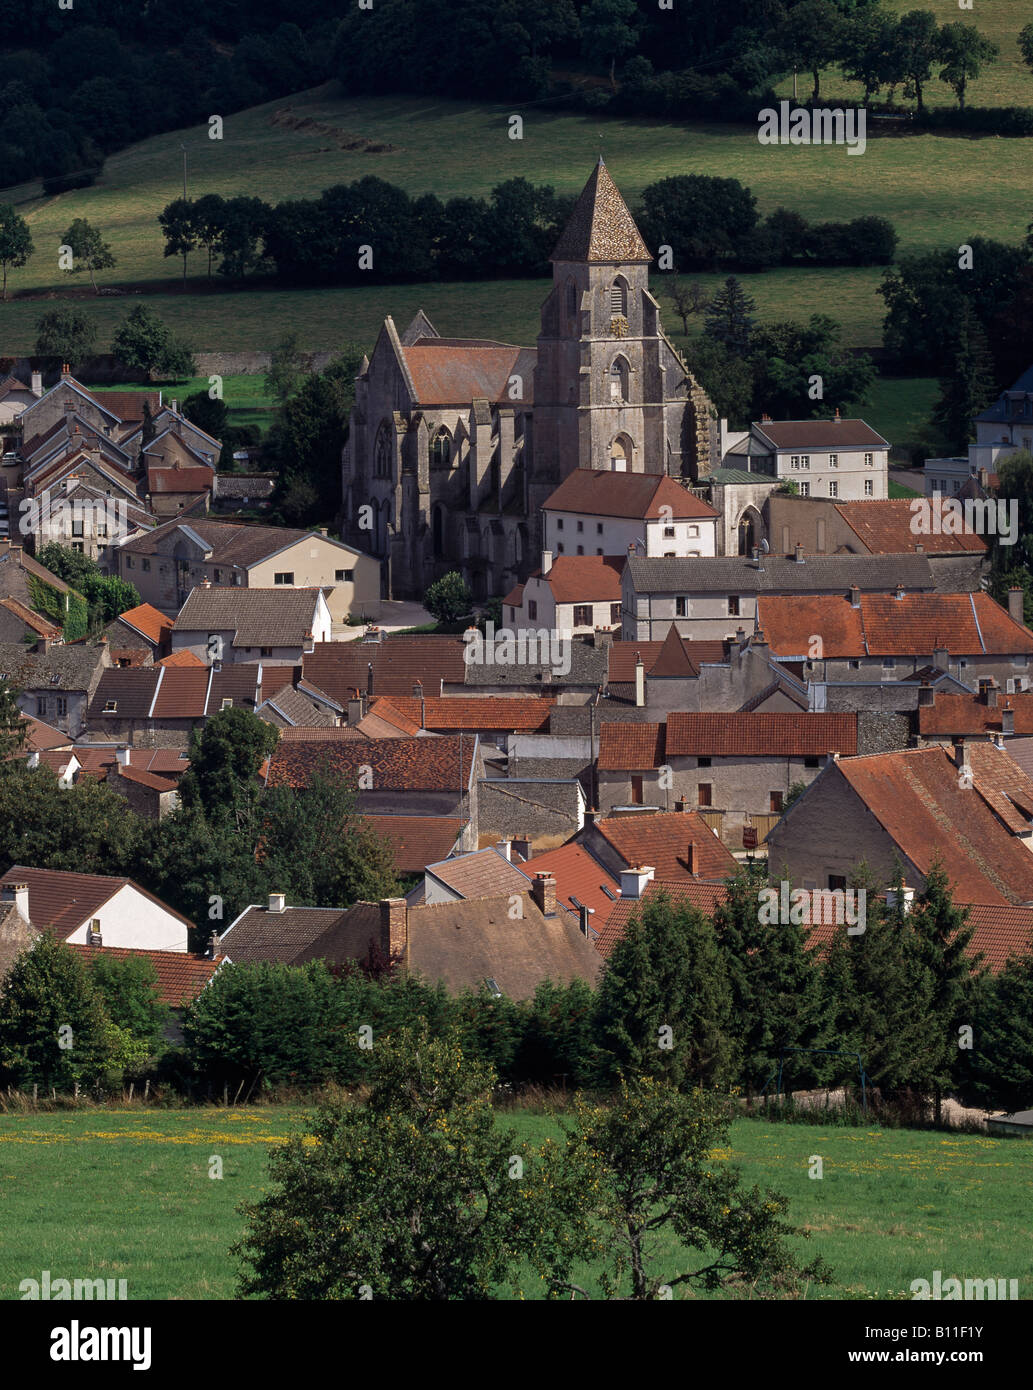 Saint-Seine-l'Abbaye, 'Dortfansicht mit Kirche St. Seine - Stock Image